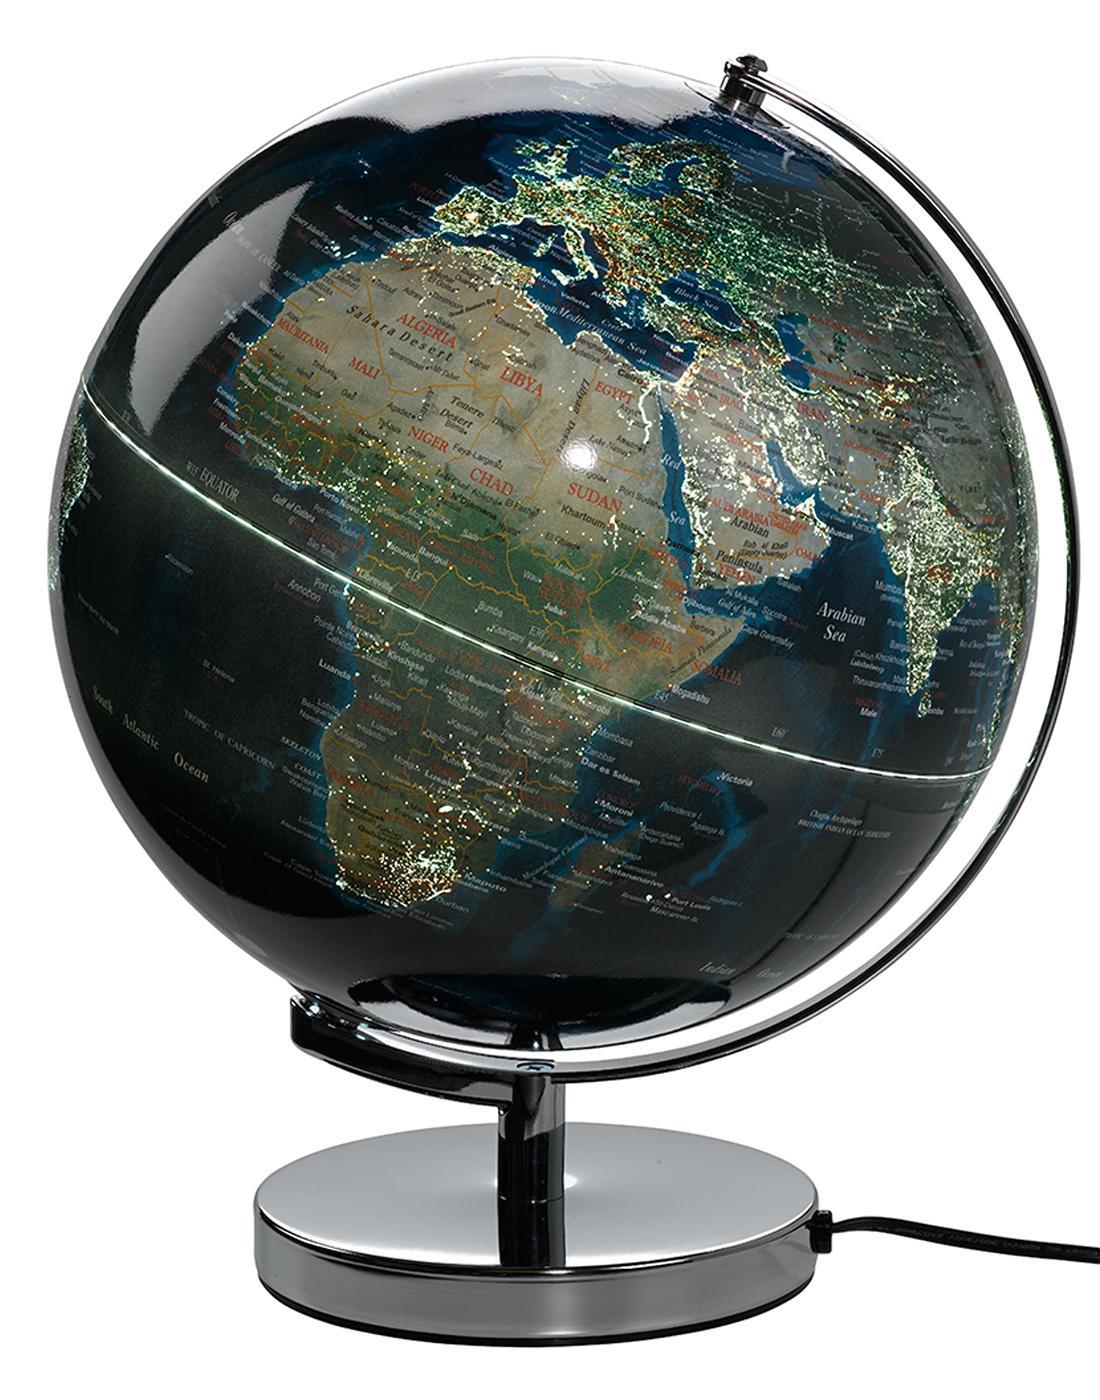 GENTLEMEN'S HARDWARE Retro City Lights Globe Lamp